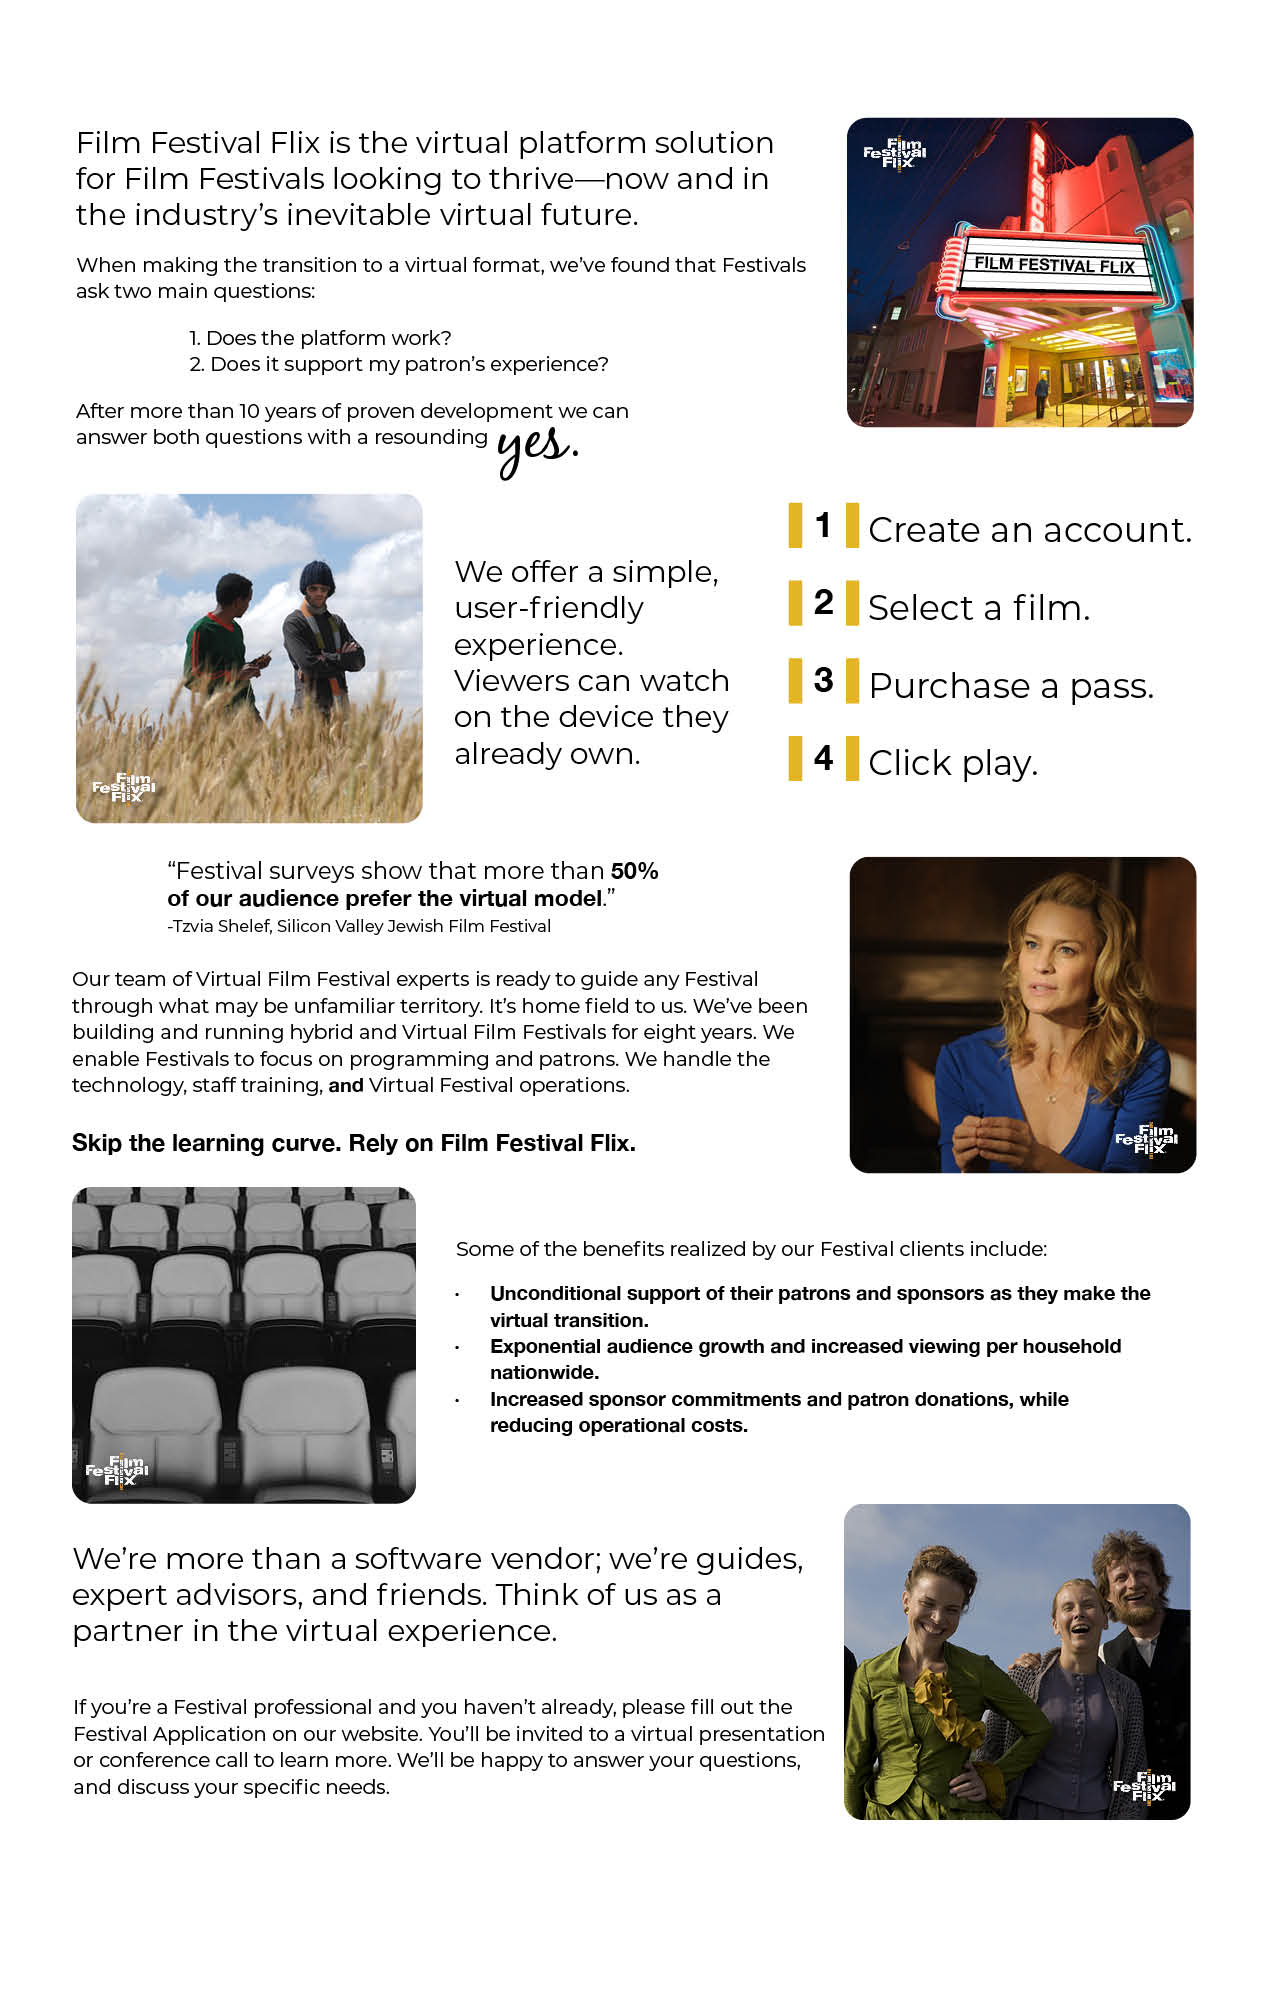 About Film Festival Flix for Festival Professionals